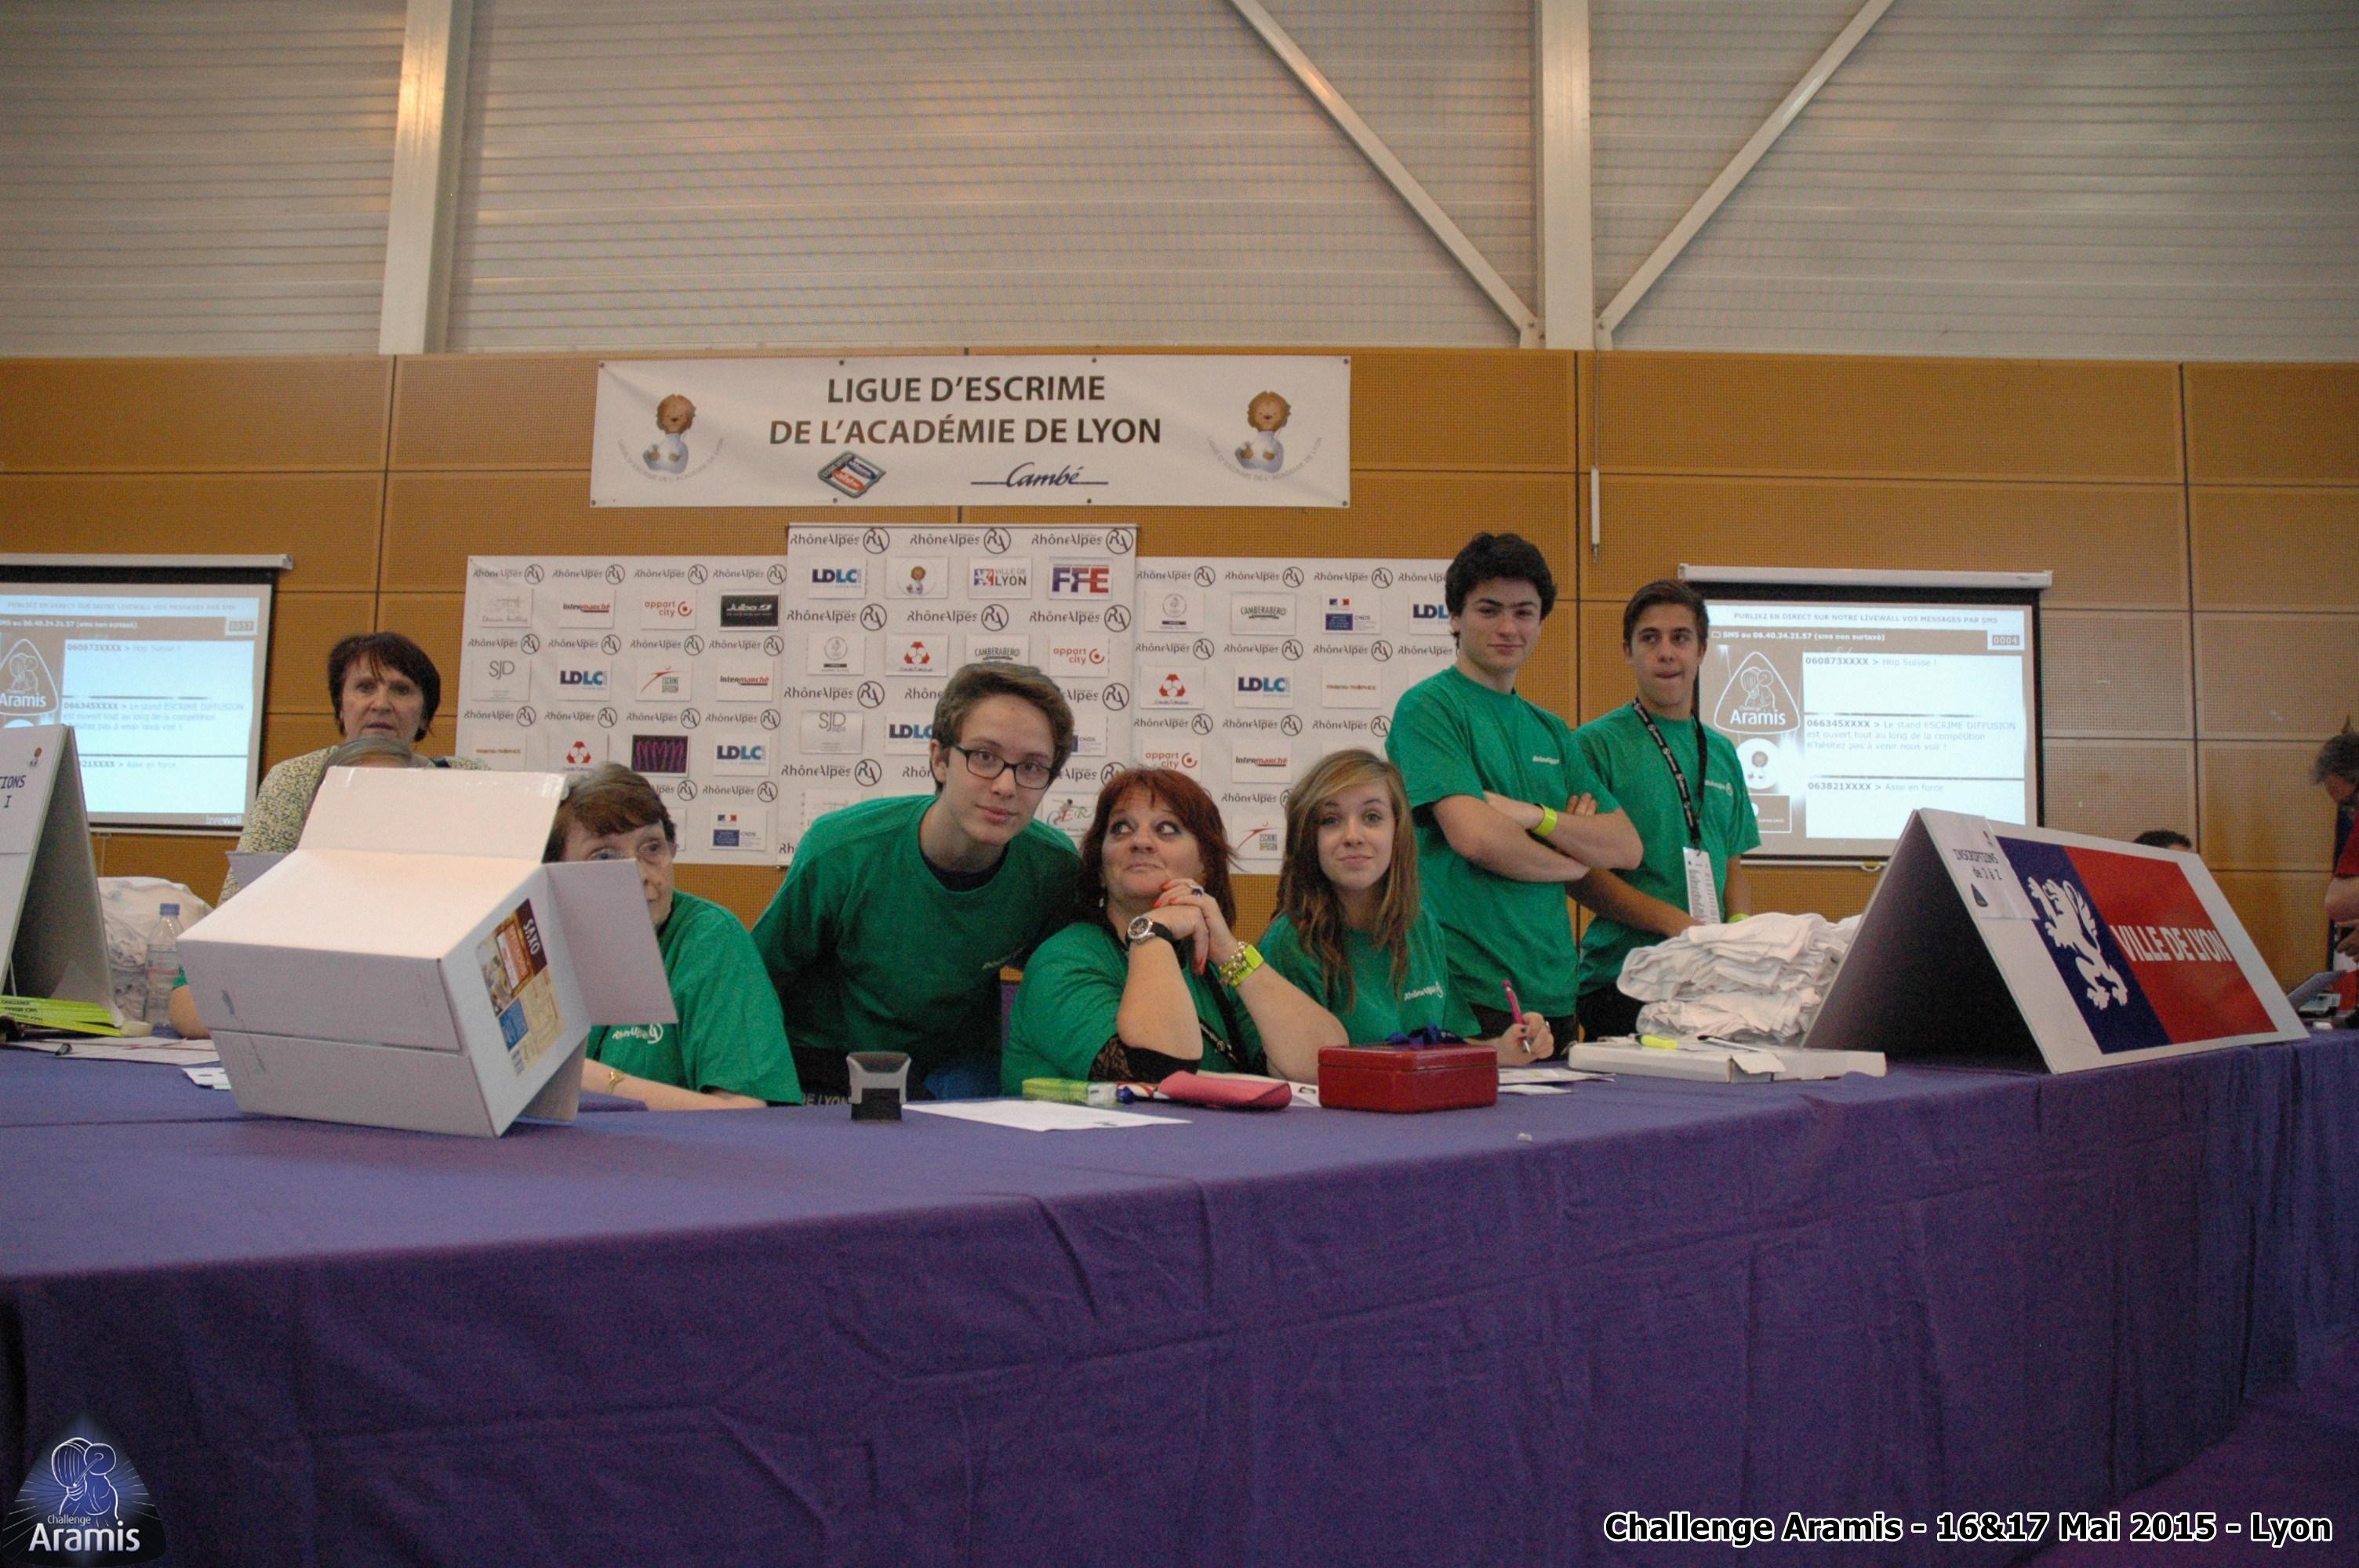 Aramis2015-20150516,11.25.38,0494